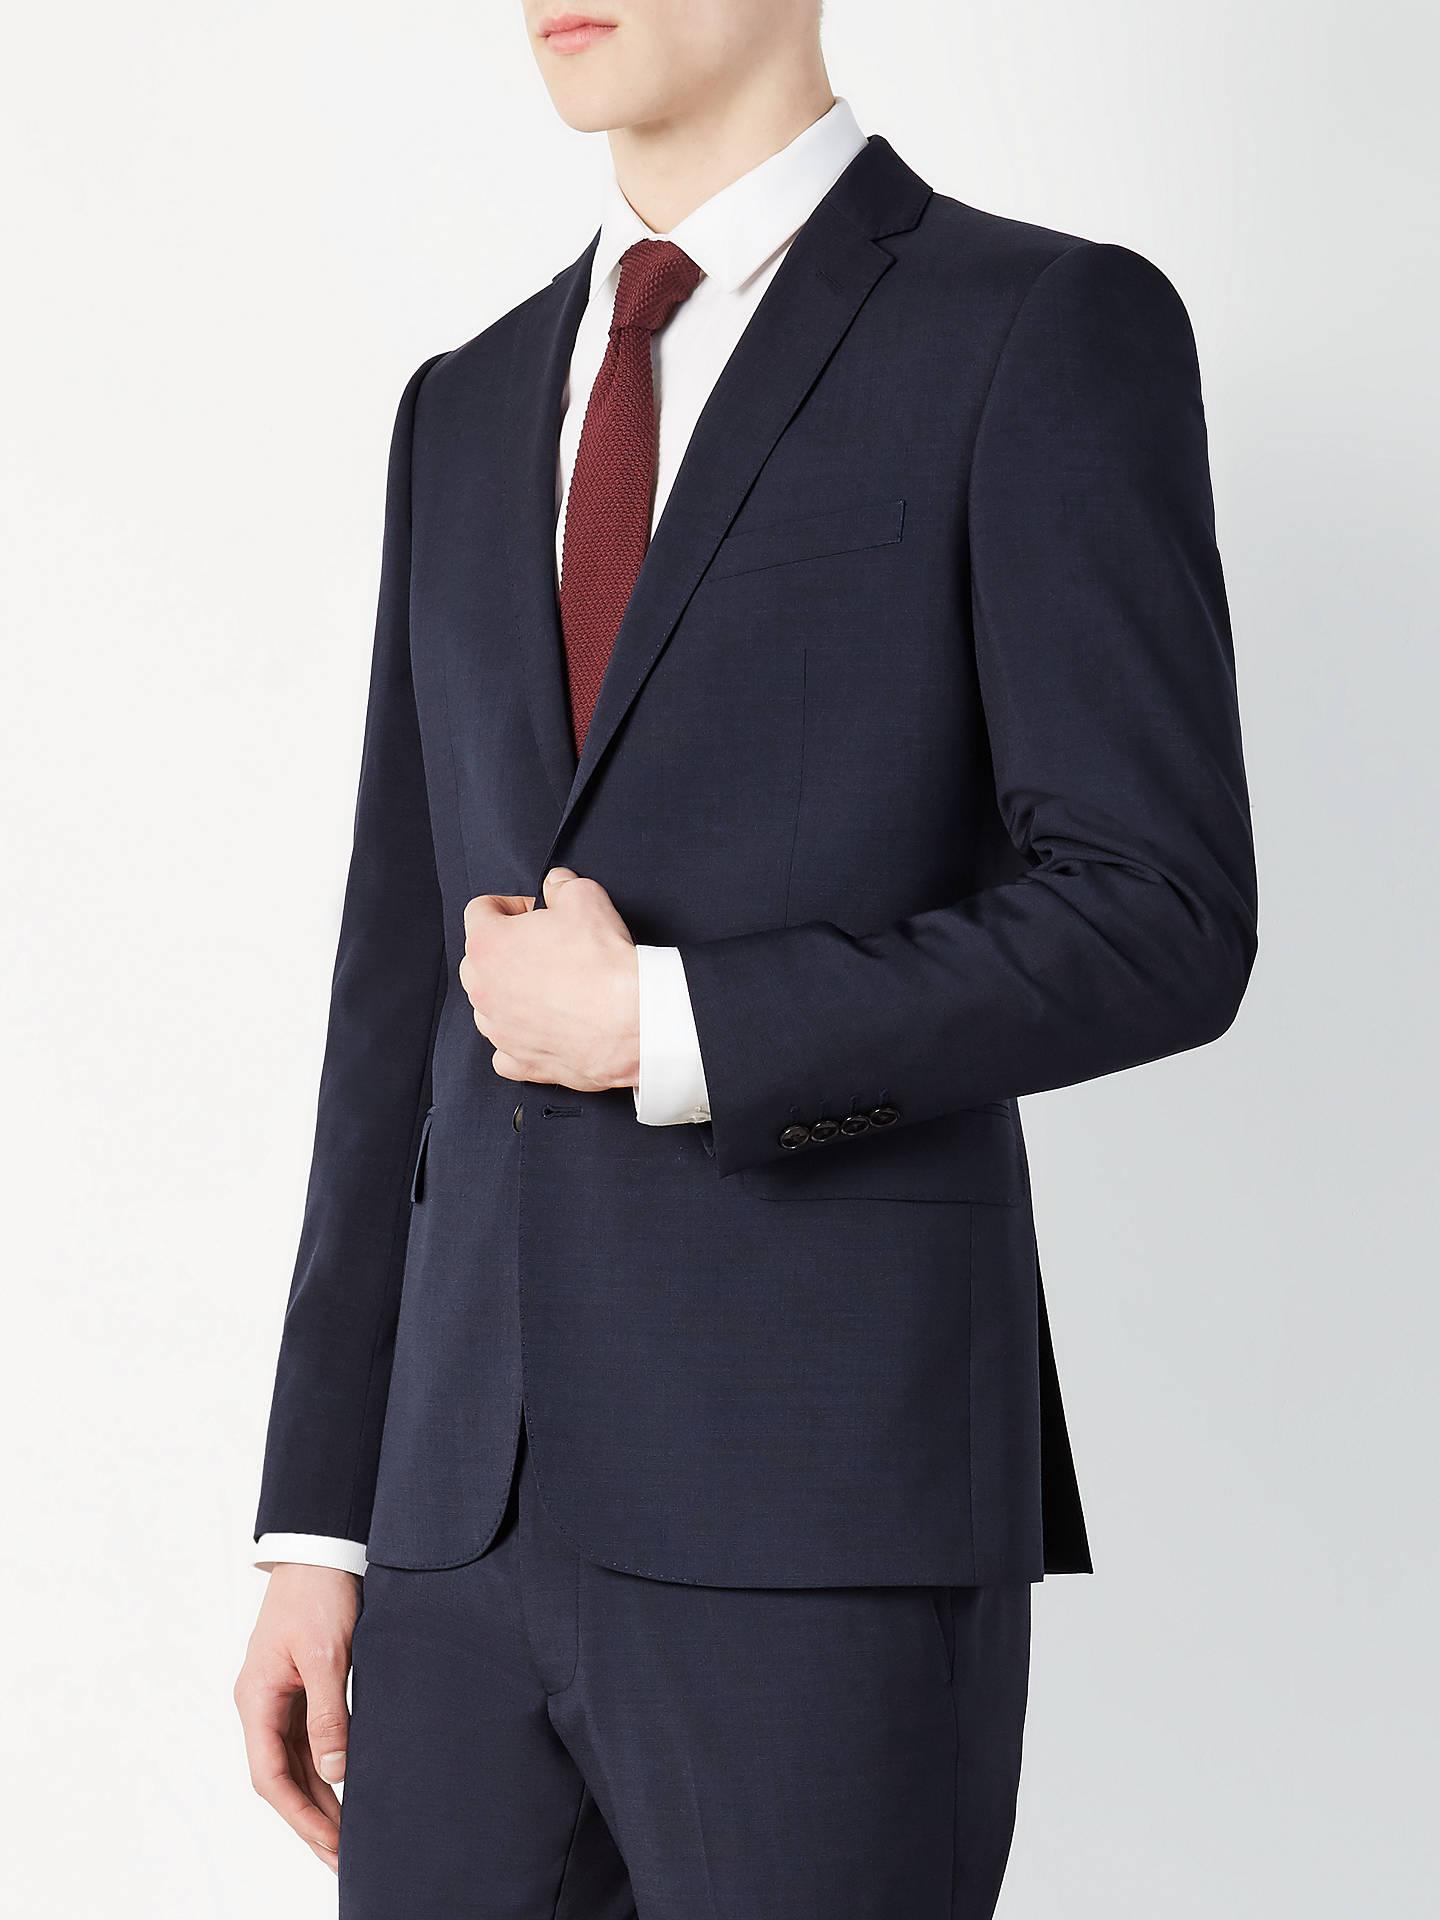 1b732634a0f Buy Kin Miller Pindot Slim Fit Suit Jacket